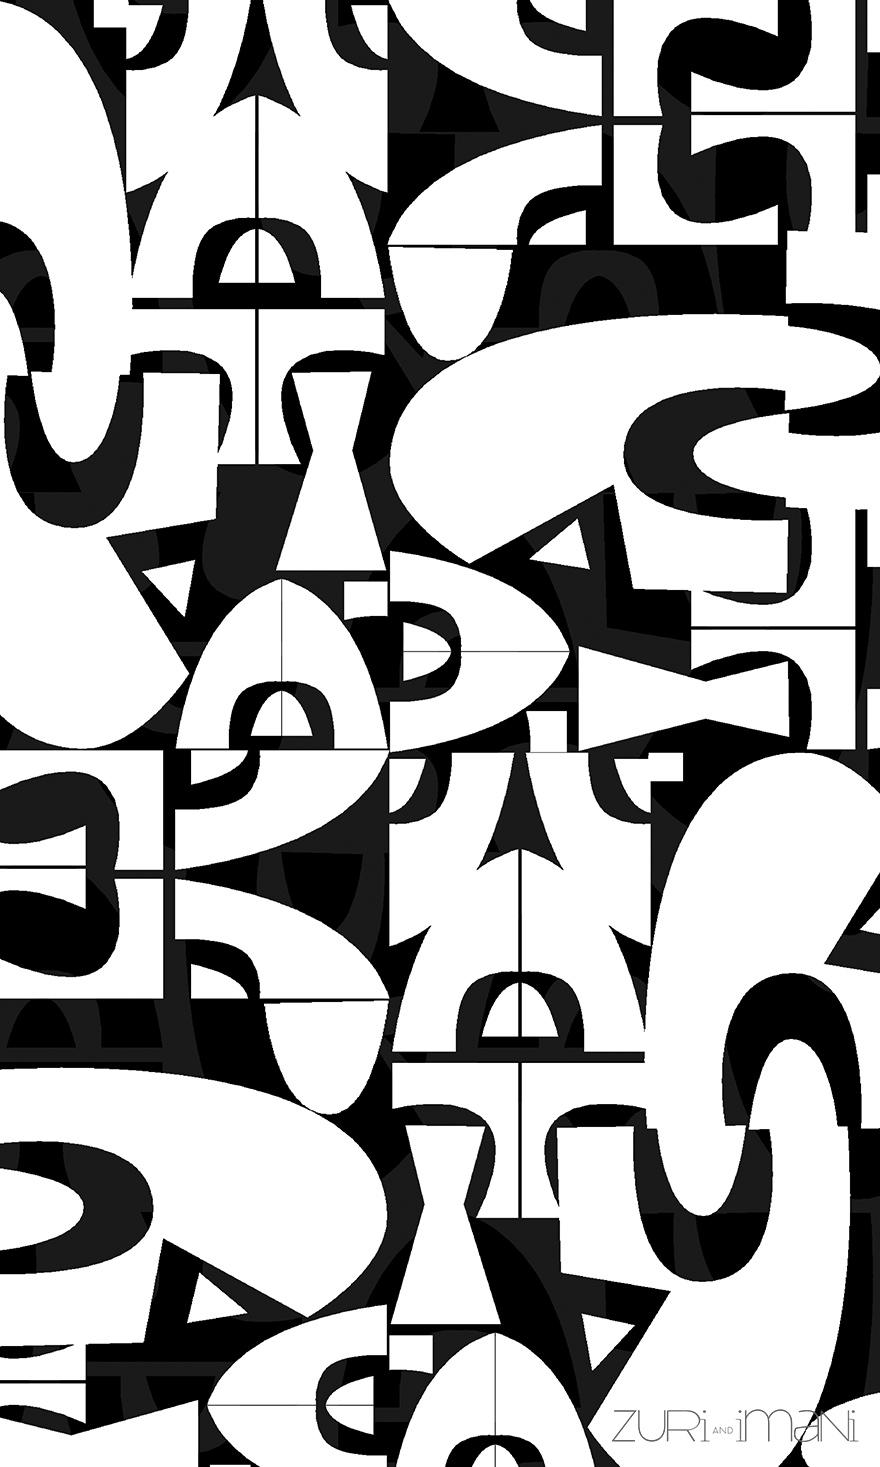 u-turn-zuri-and-imani-surface-design-african-prints